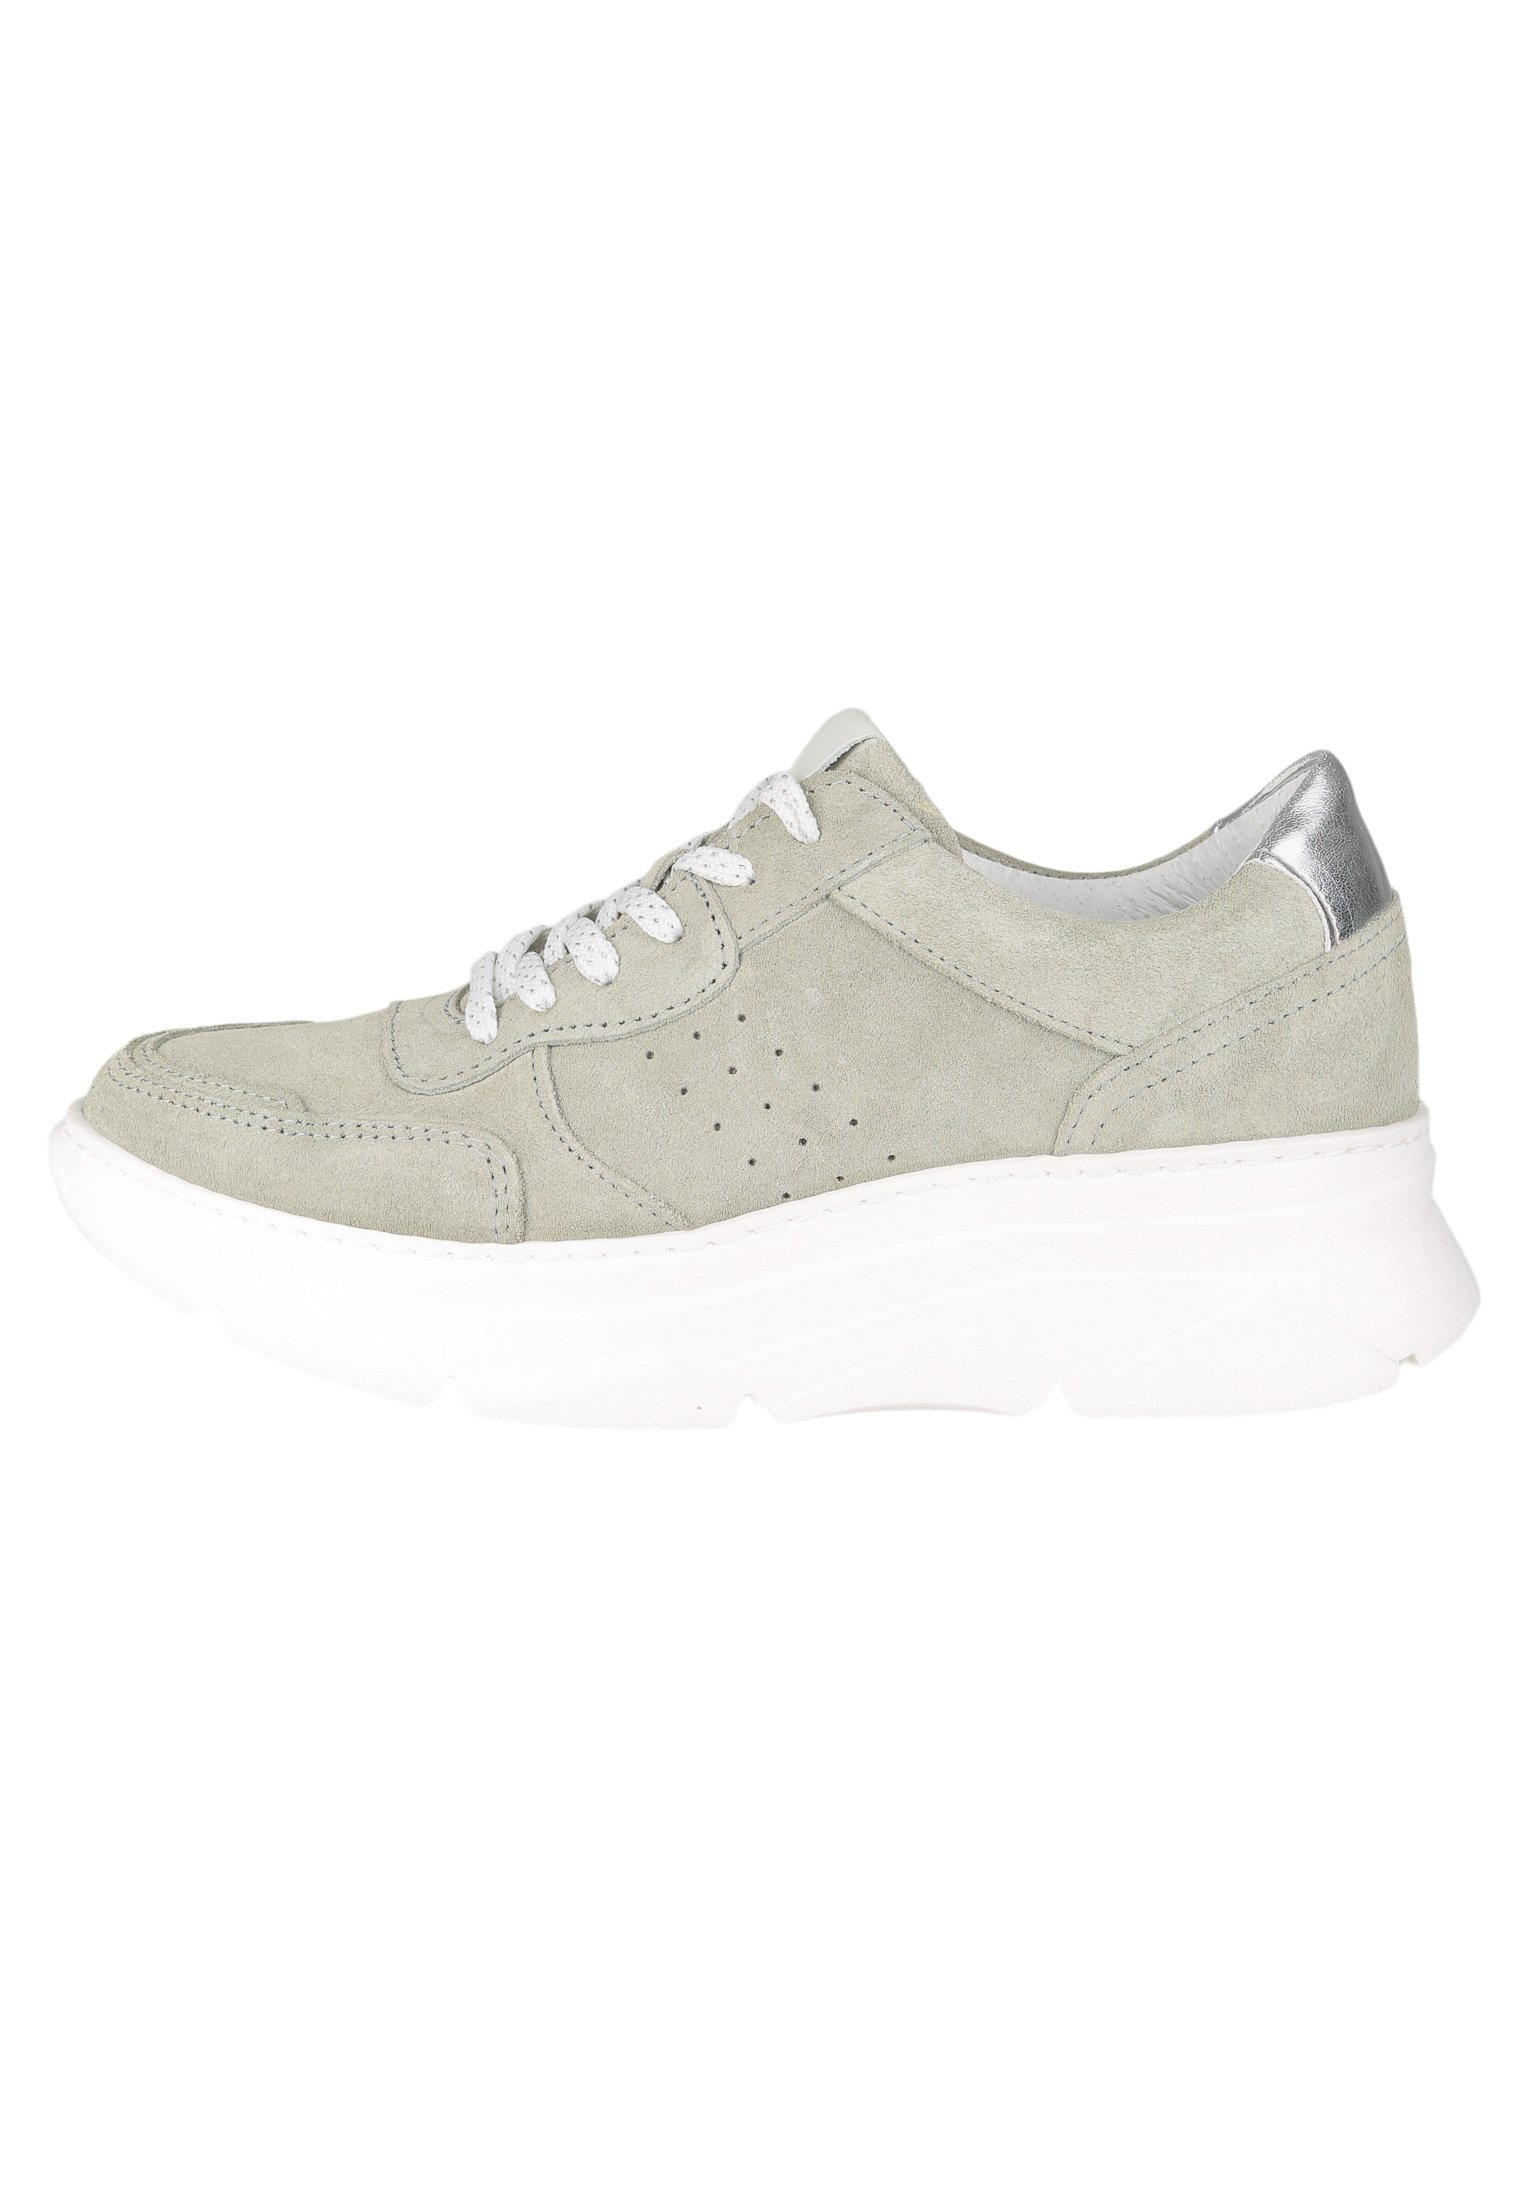 Cox Trend - Sneakers Basse Grey rqbUJ